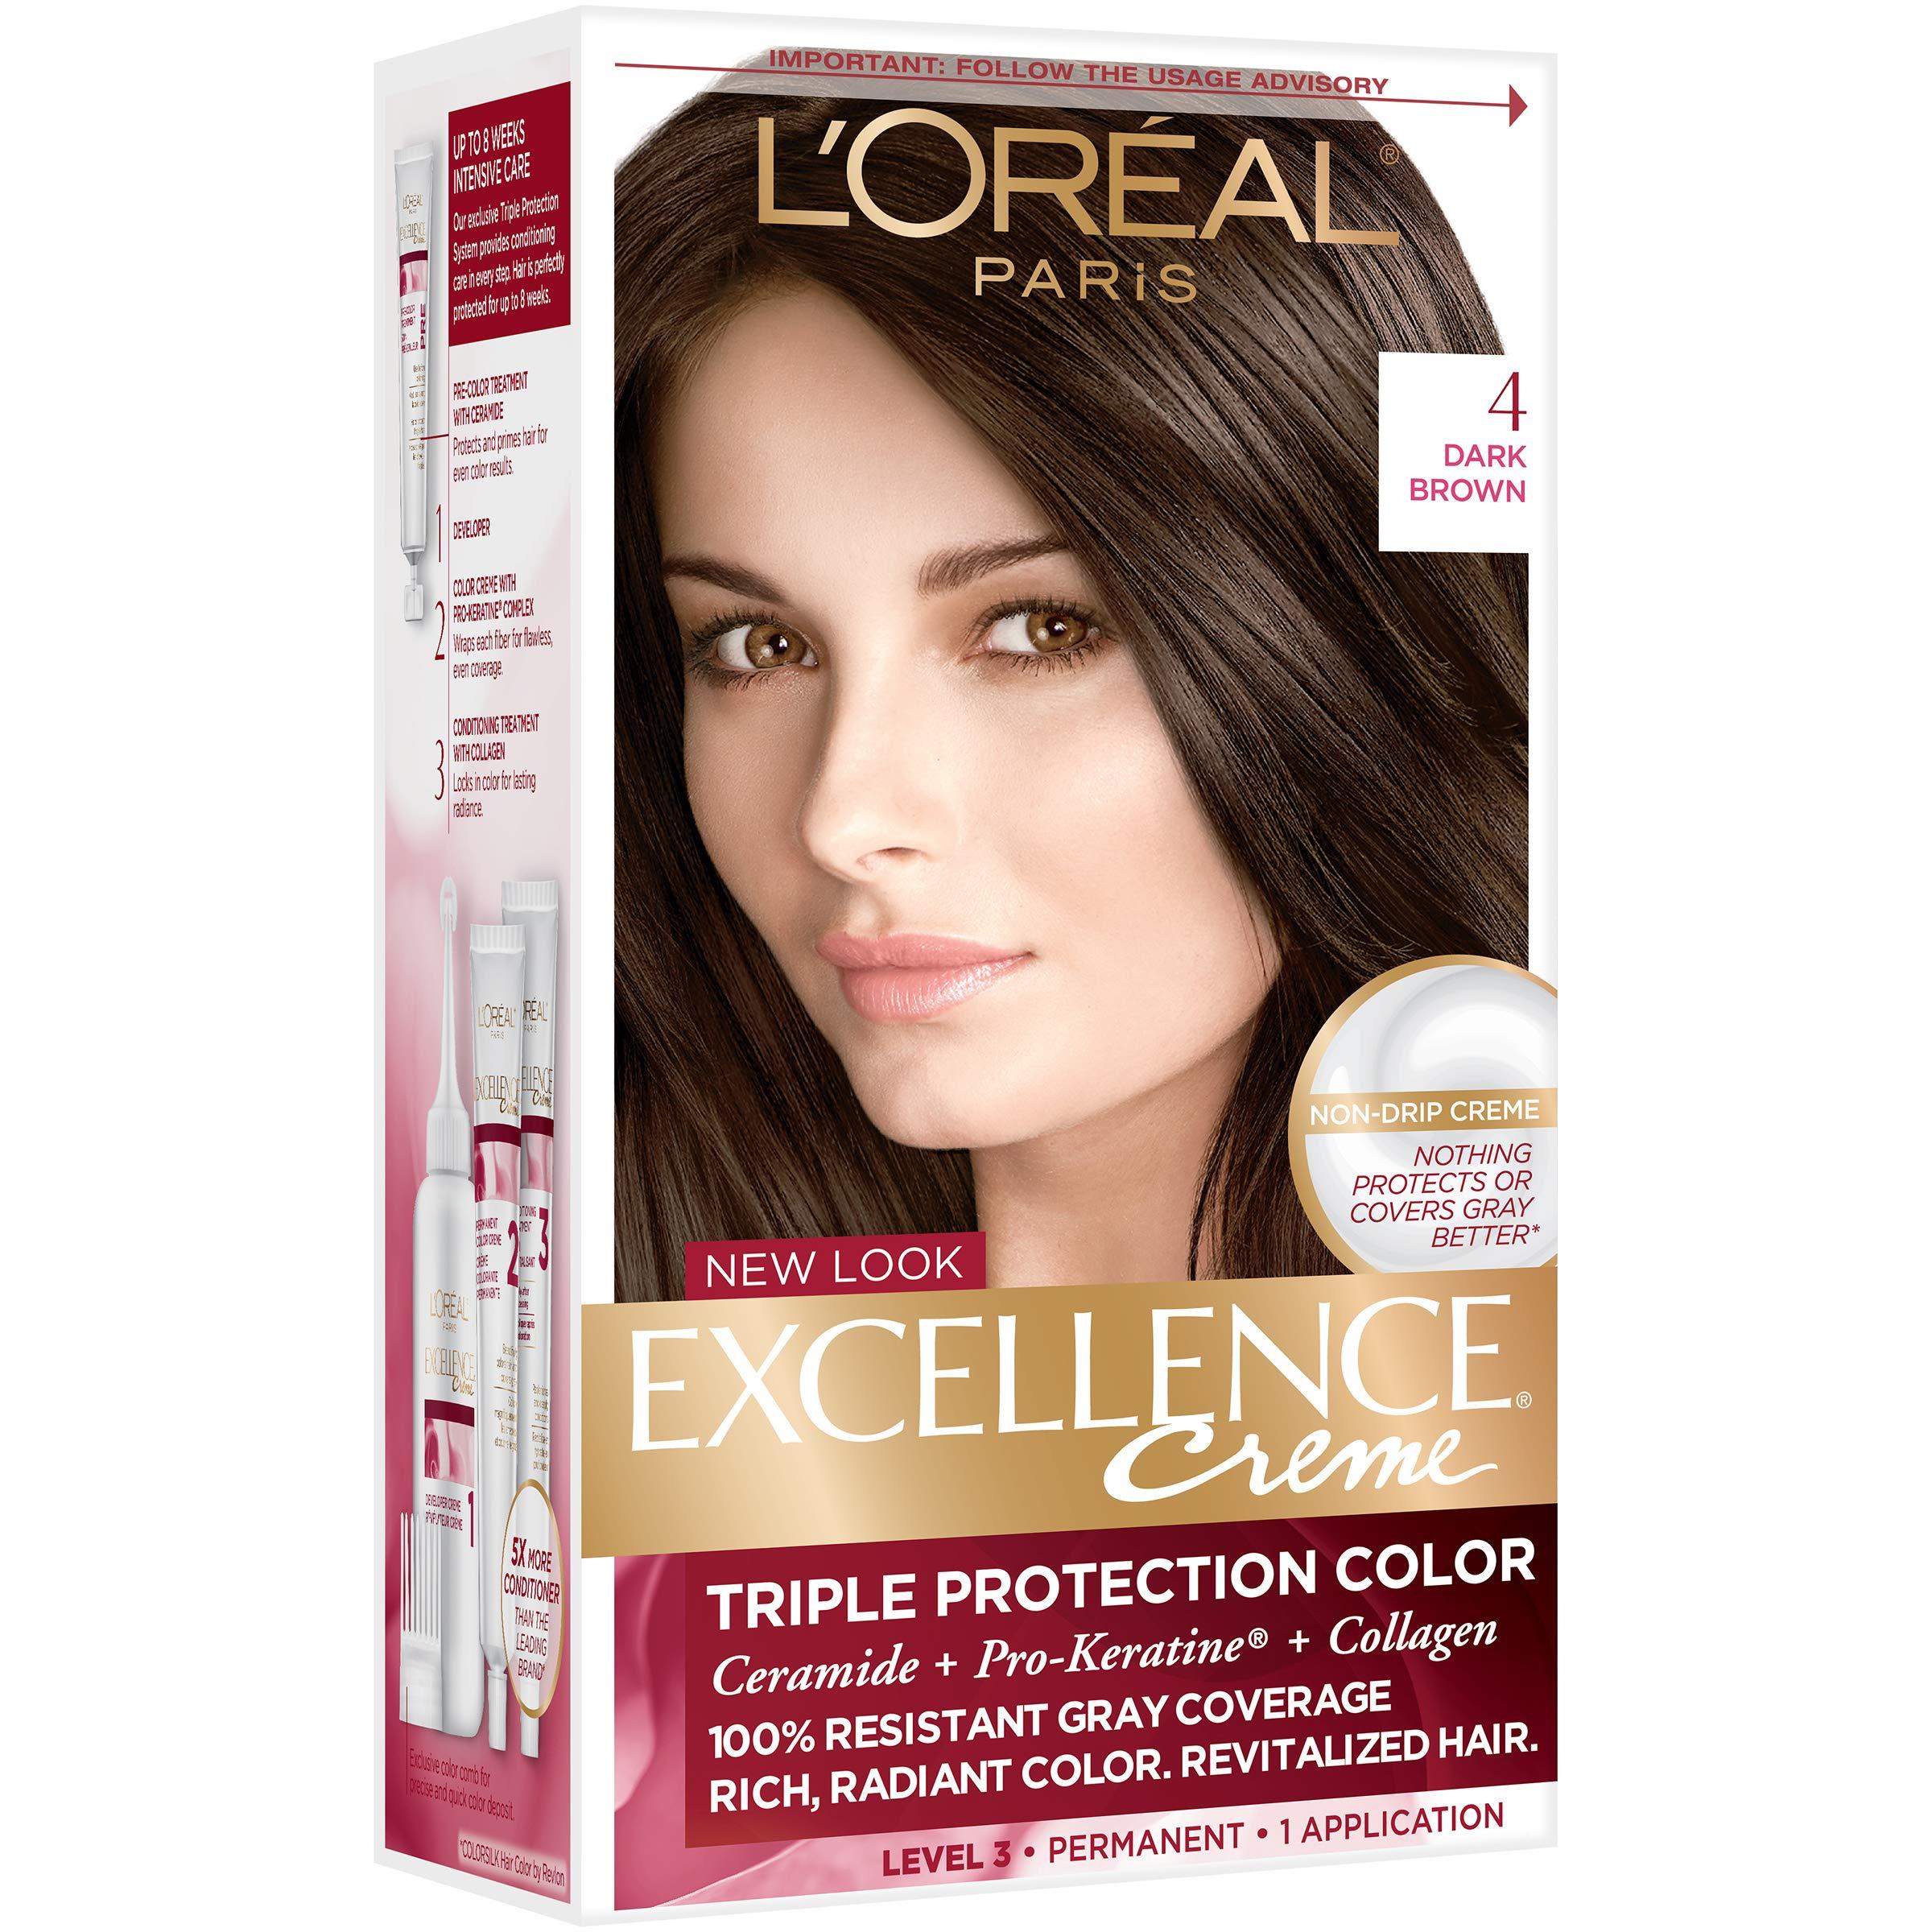 LOreal Paris Excellence Creme Hair Color, 4 Dark Brown  Amazon